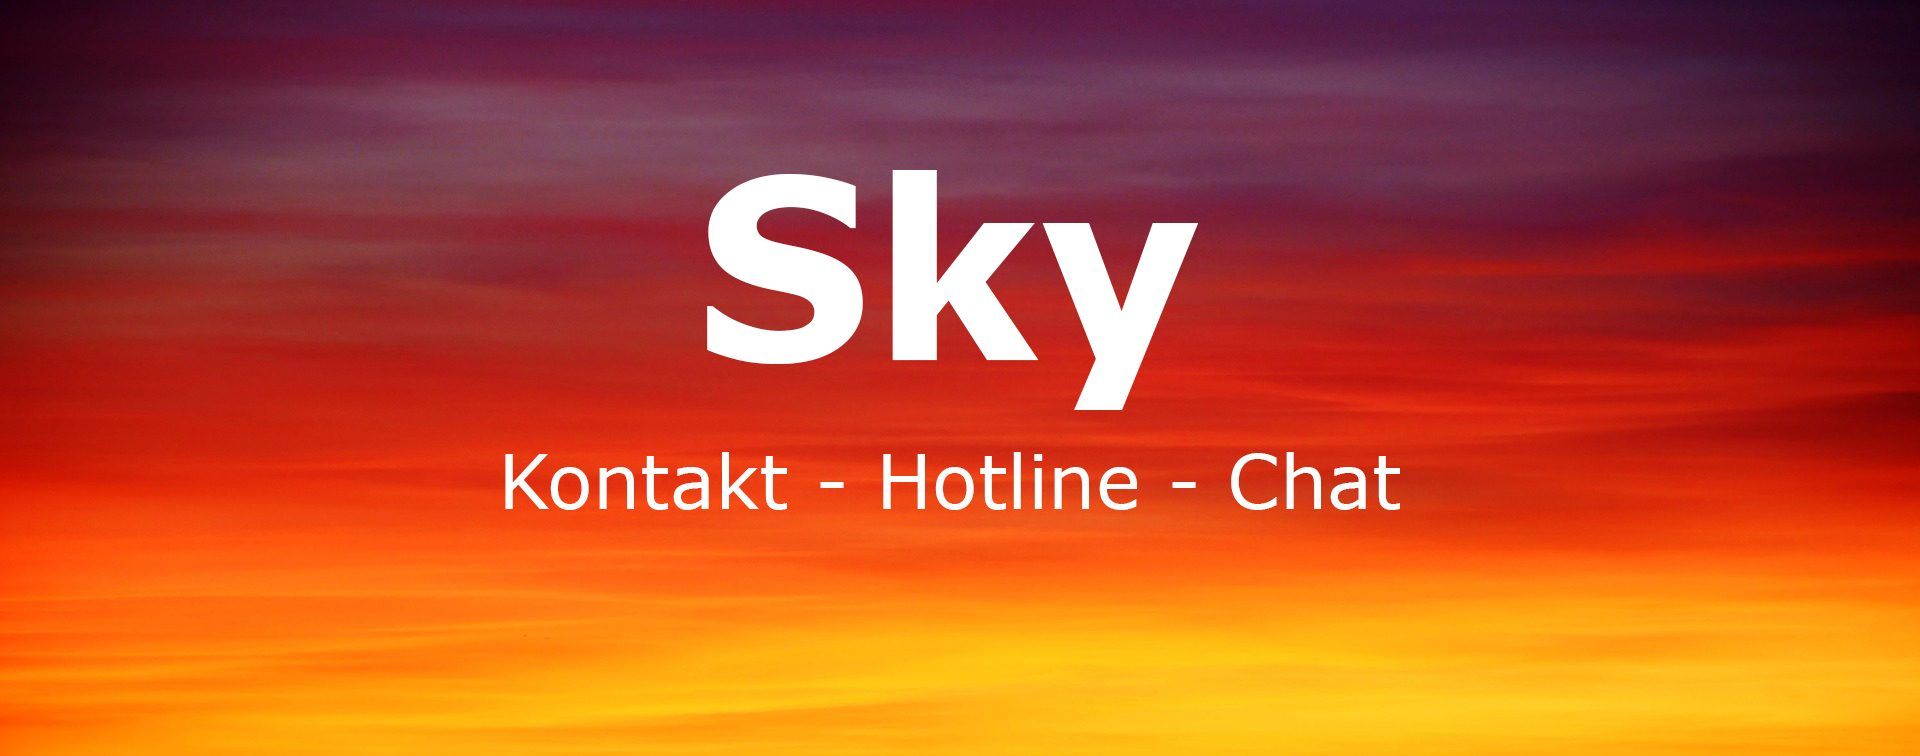 Kostenlose Hotline Sky